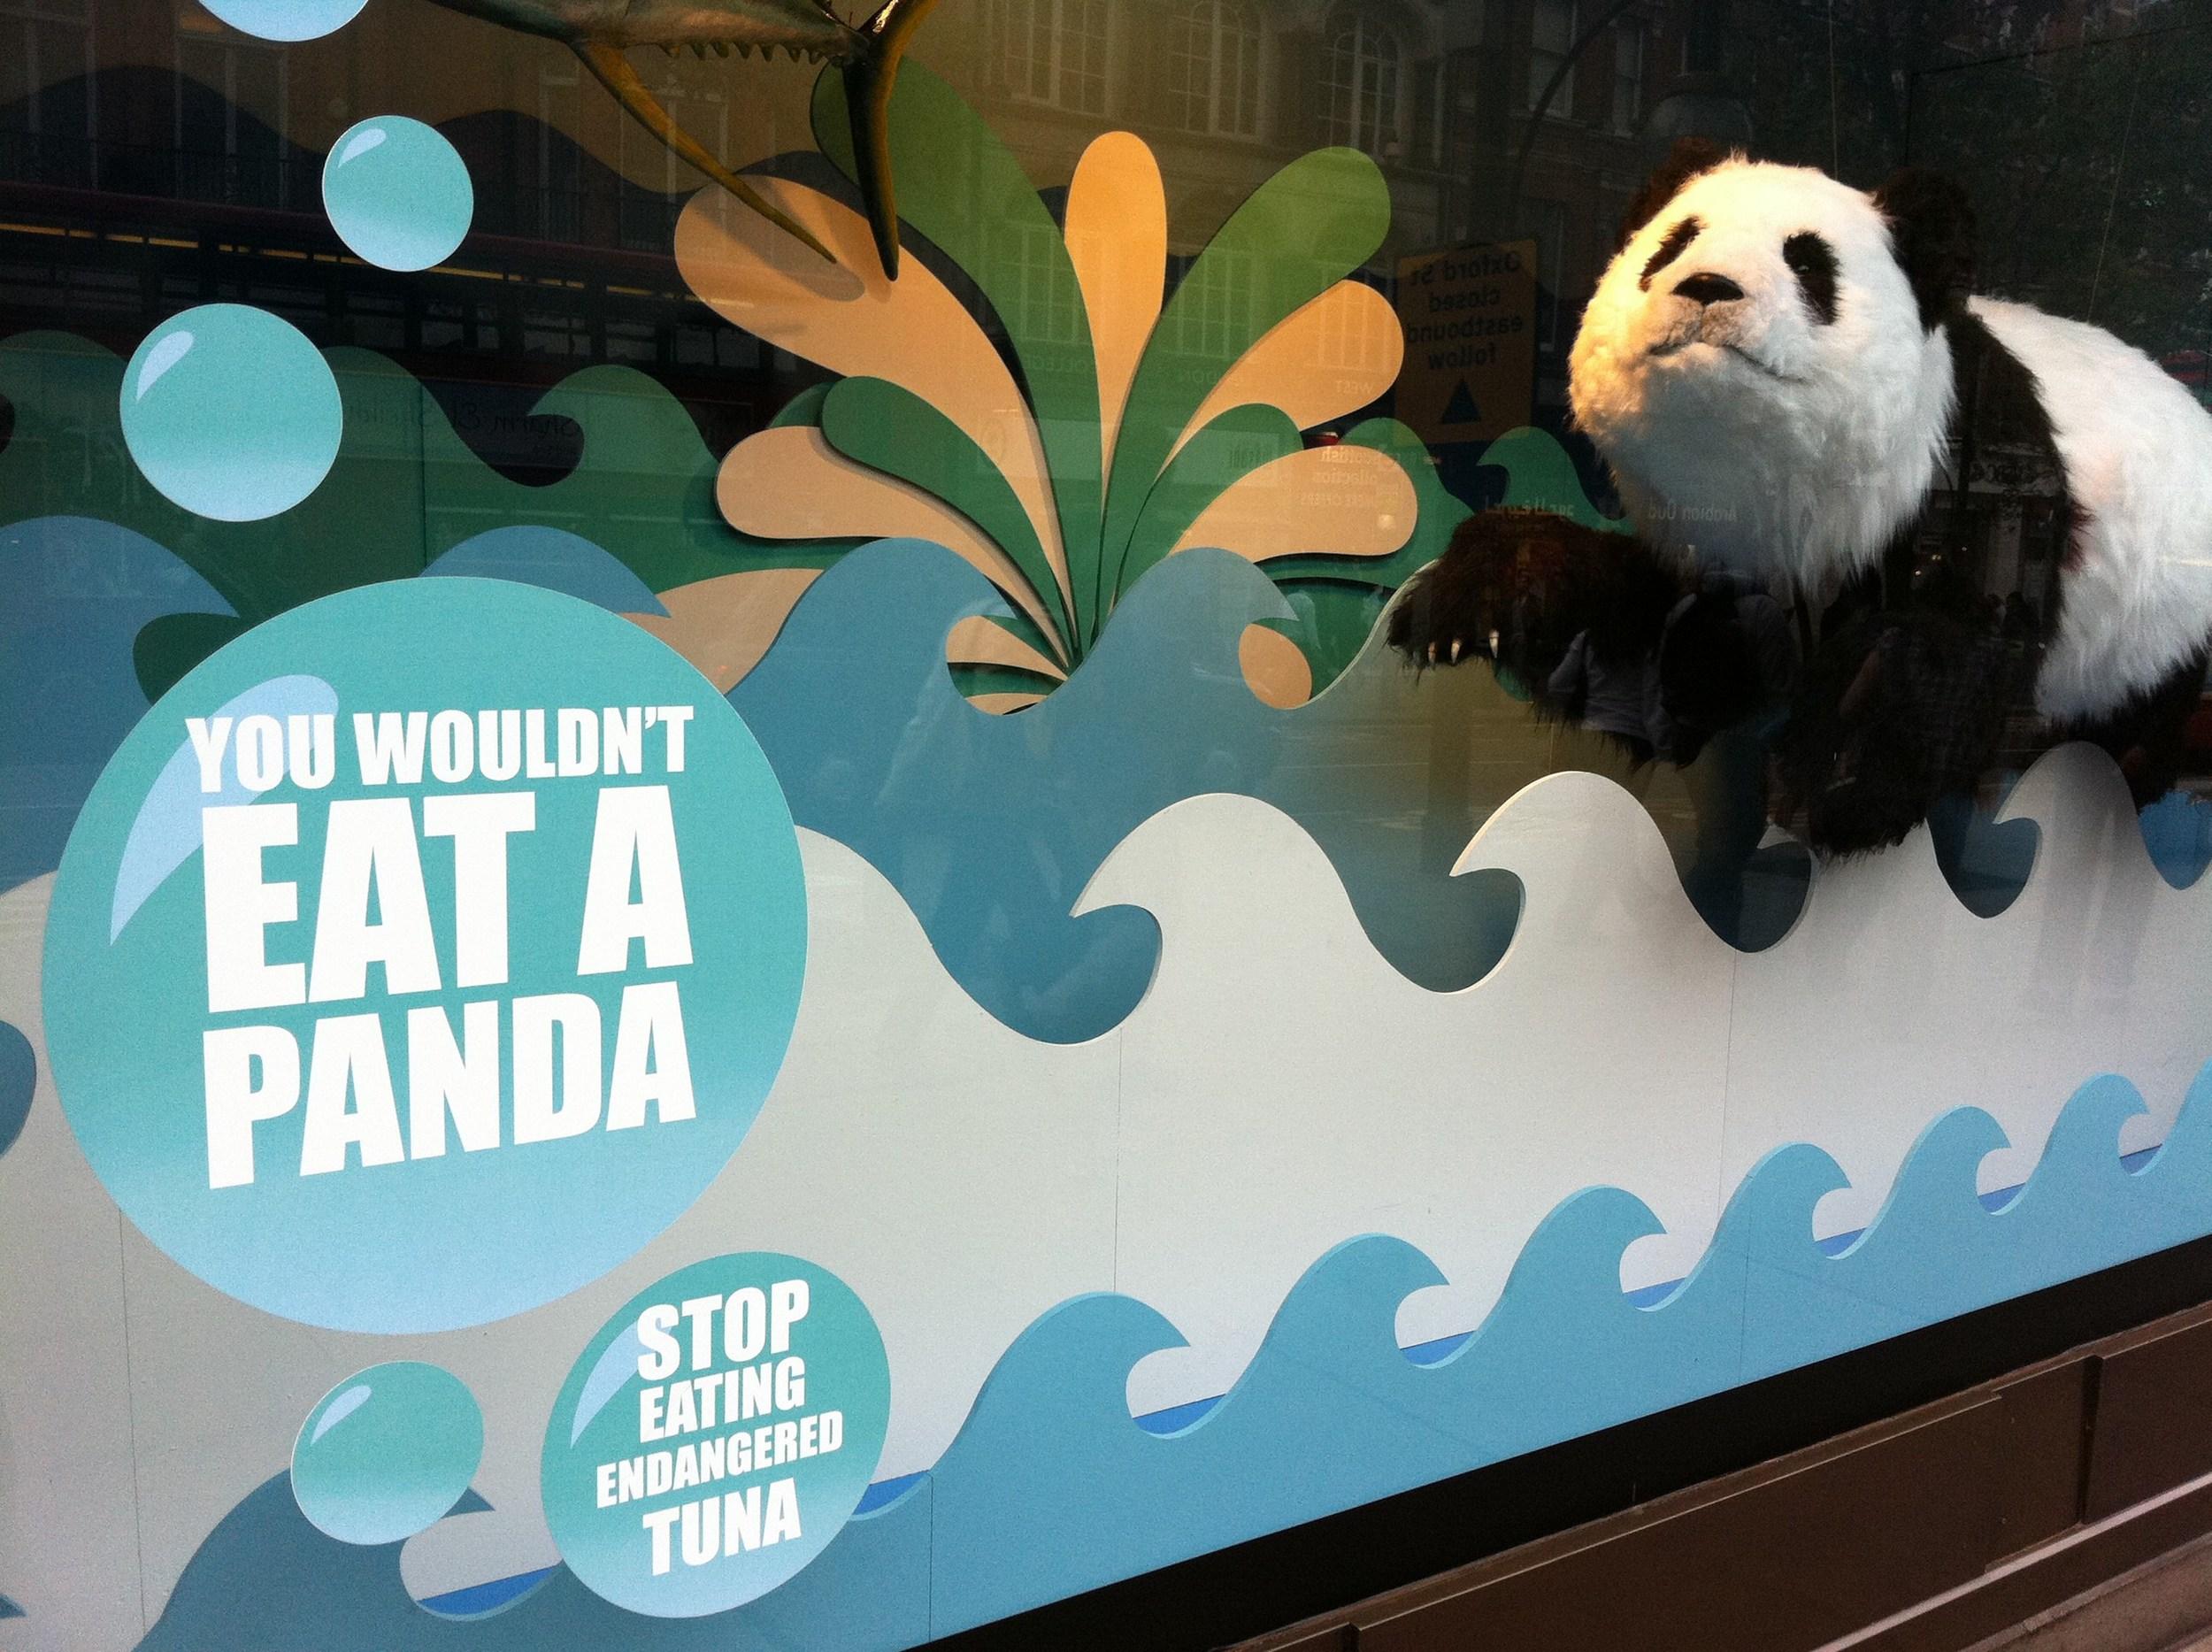 Youwouldn'teata panda